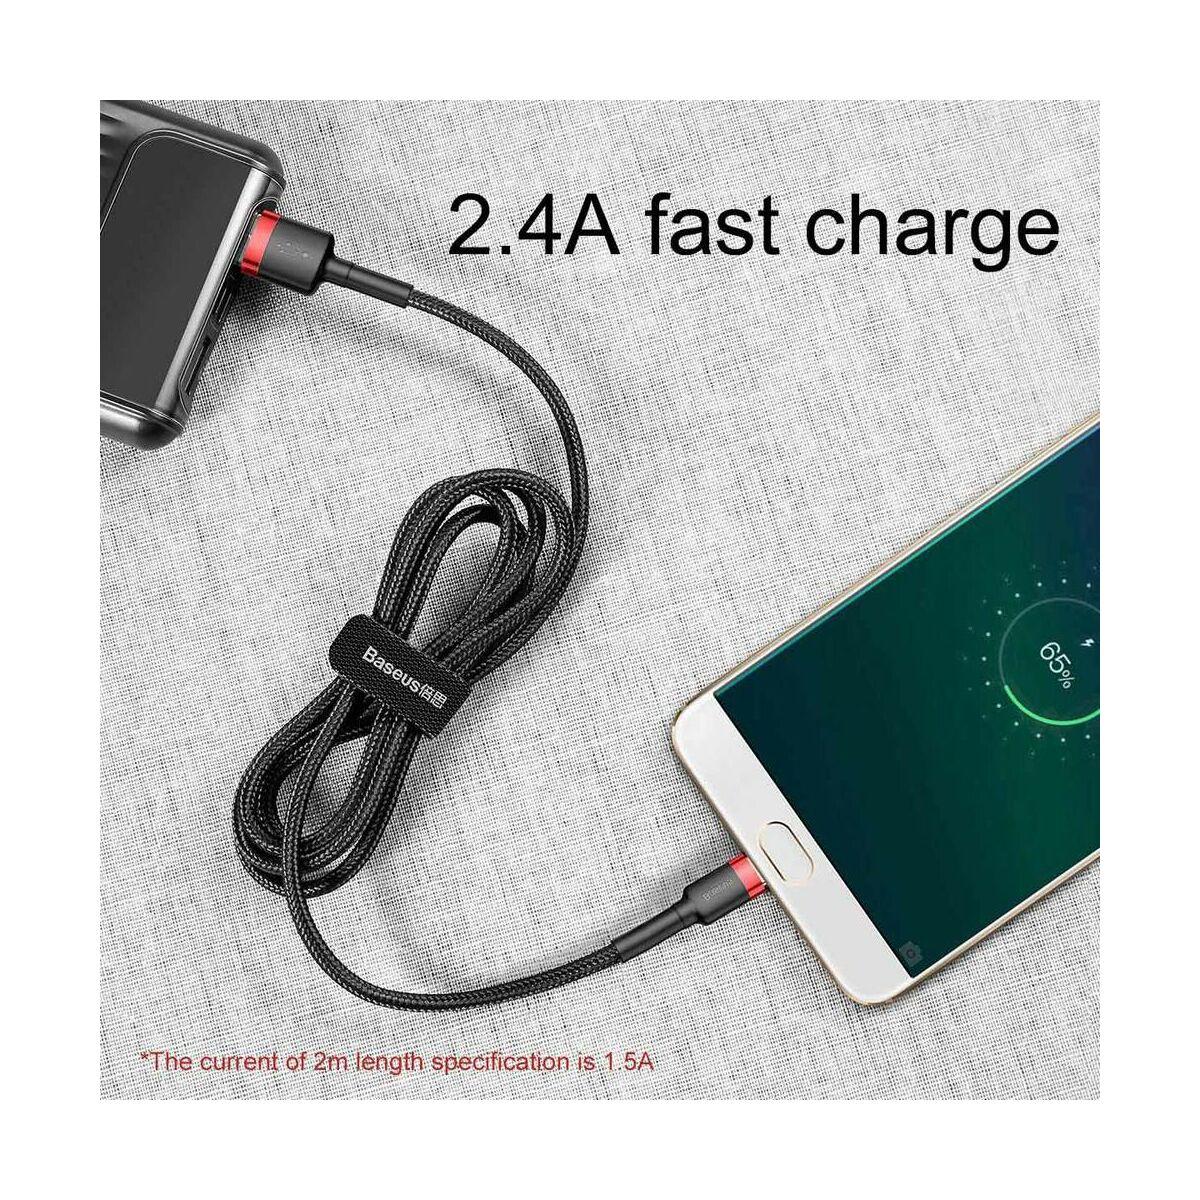 Baseus Micro USB kábel, Cafule 2.4A, 0.5m, piros/fekete (CAMKLF-A91)